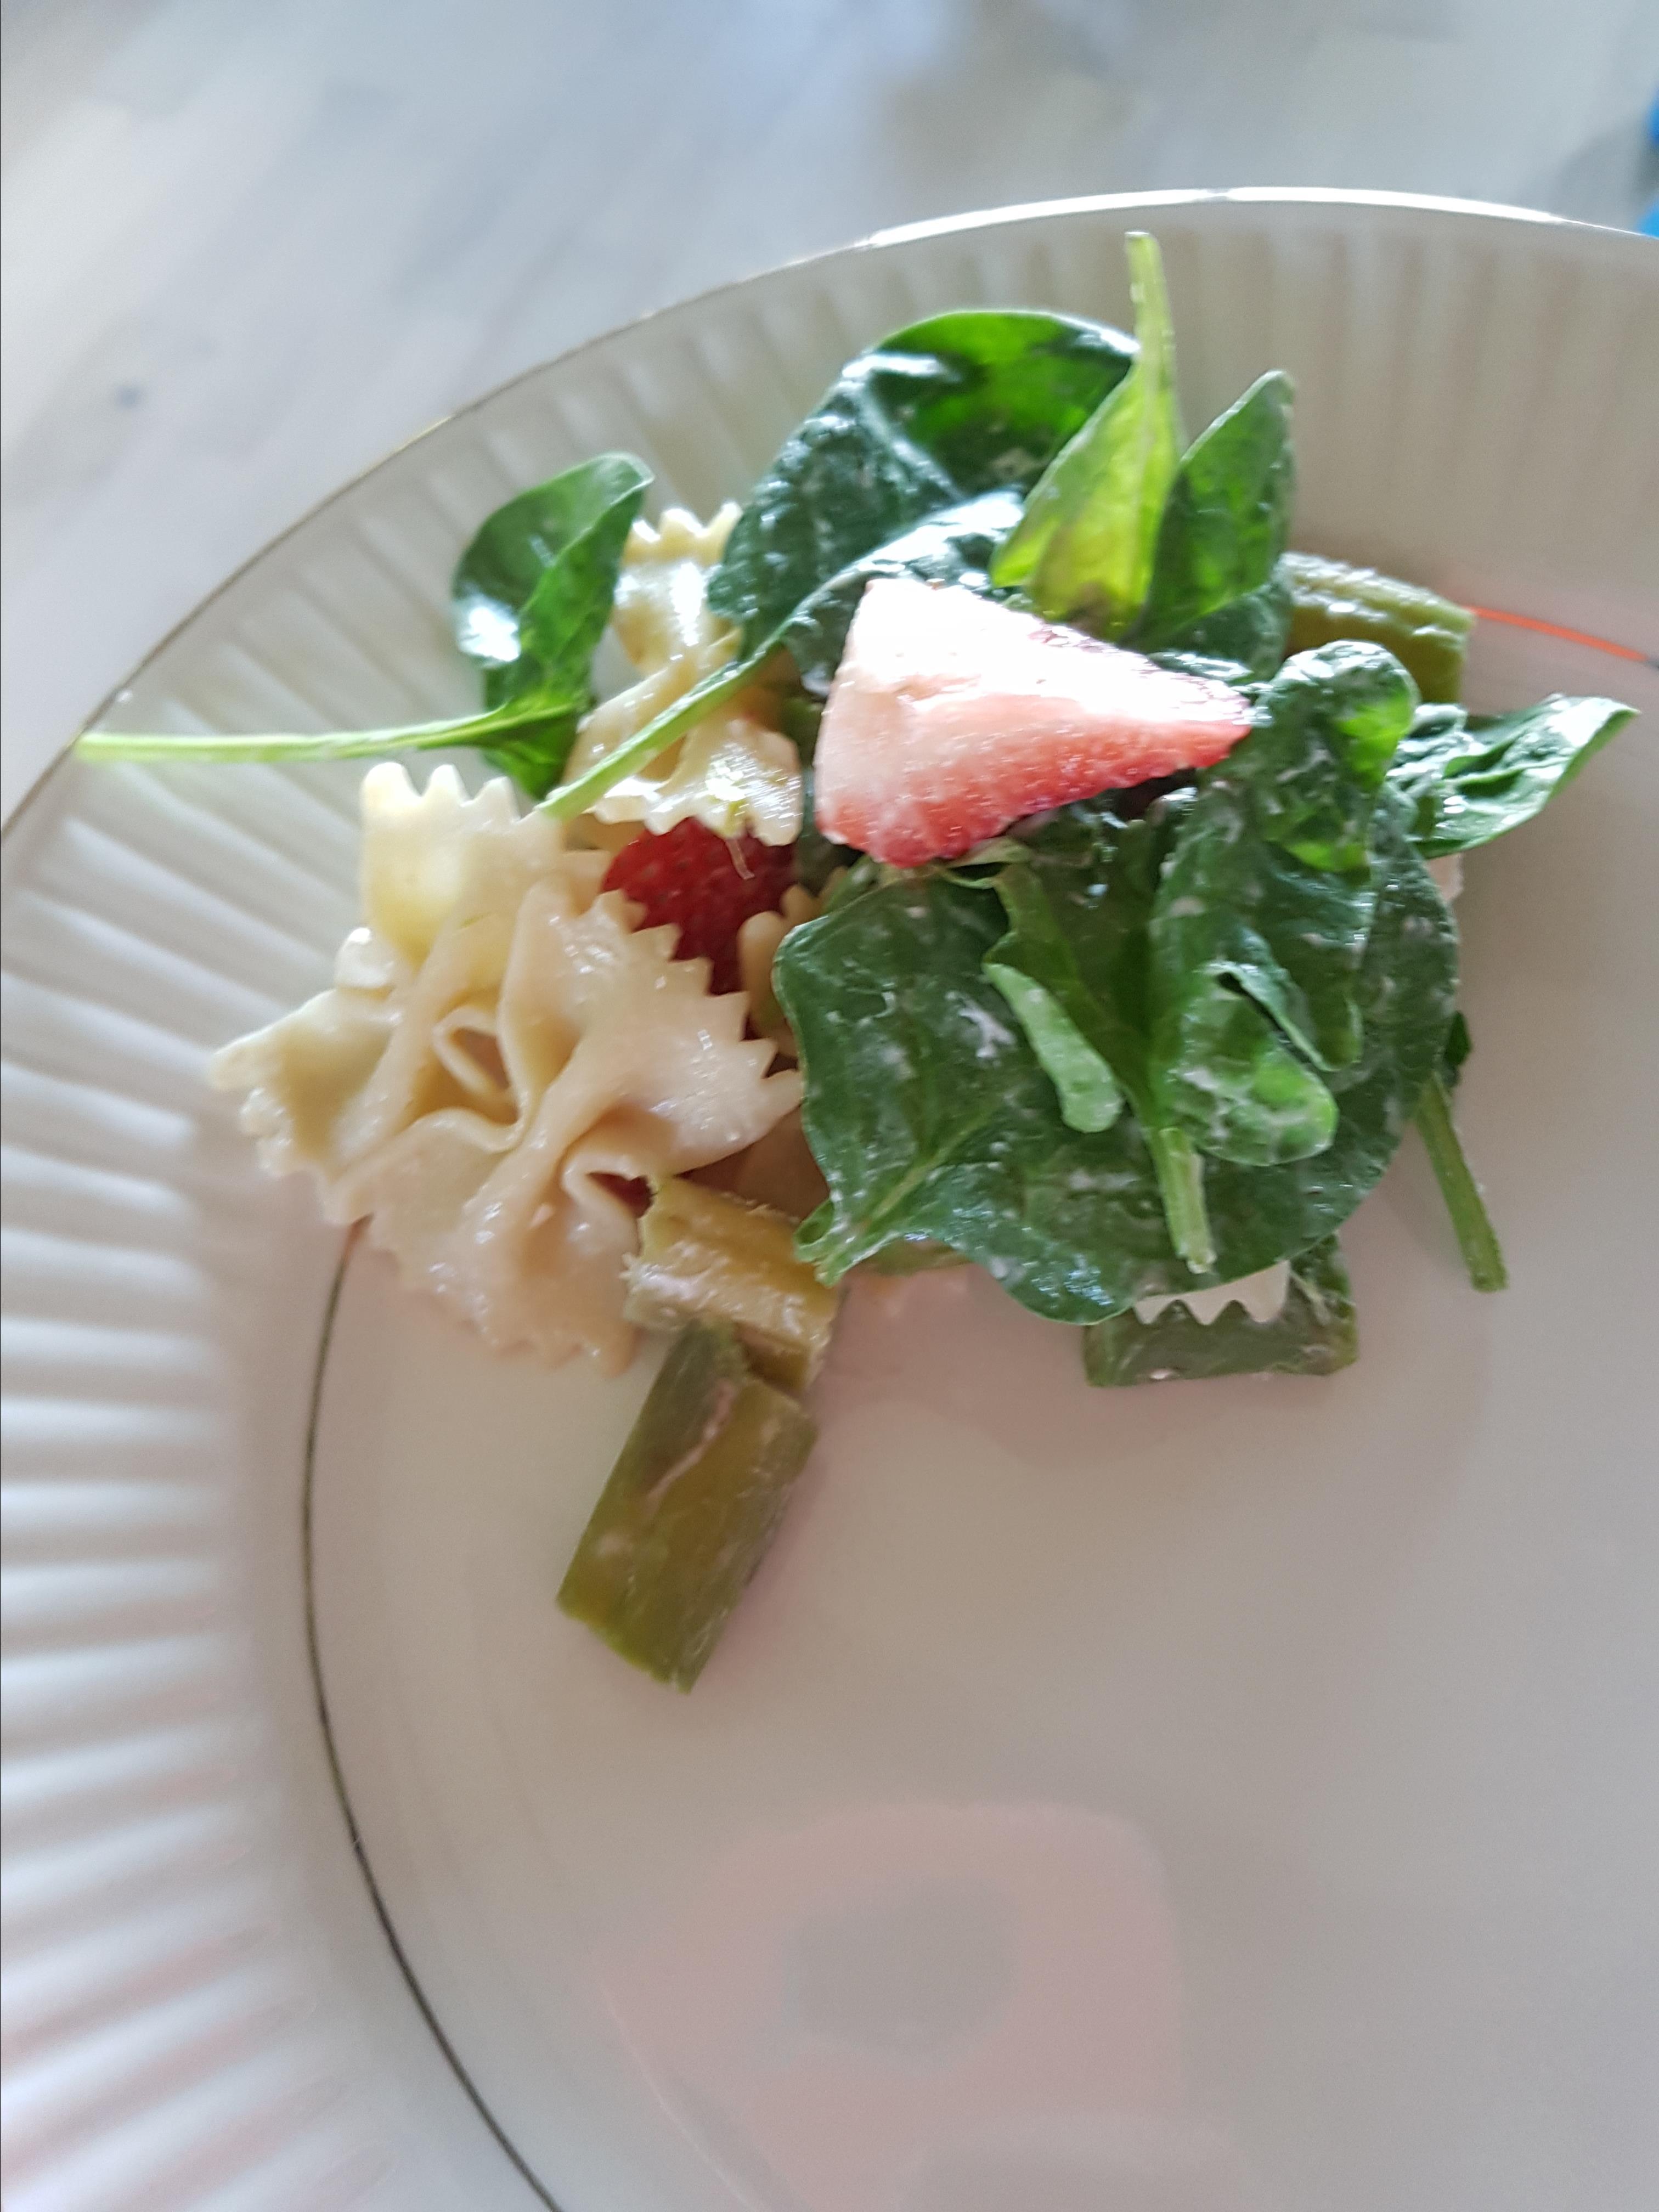 Strawberry-Asparagus Pasta Salad